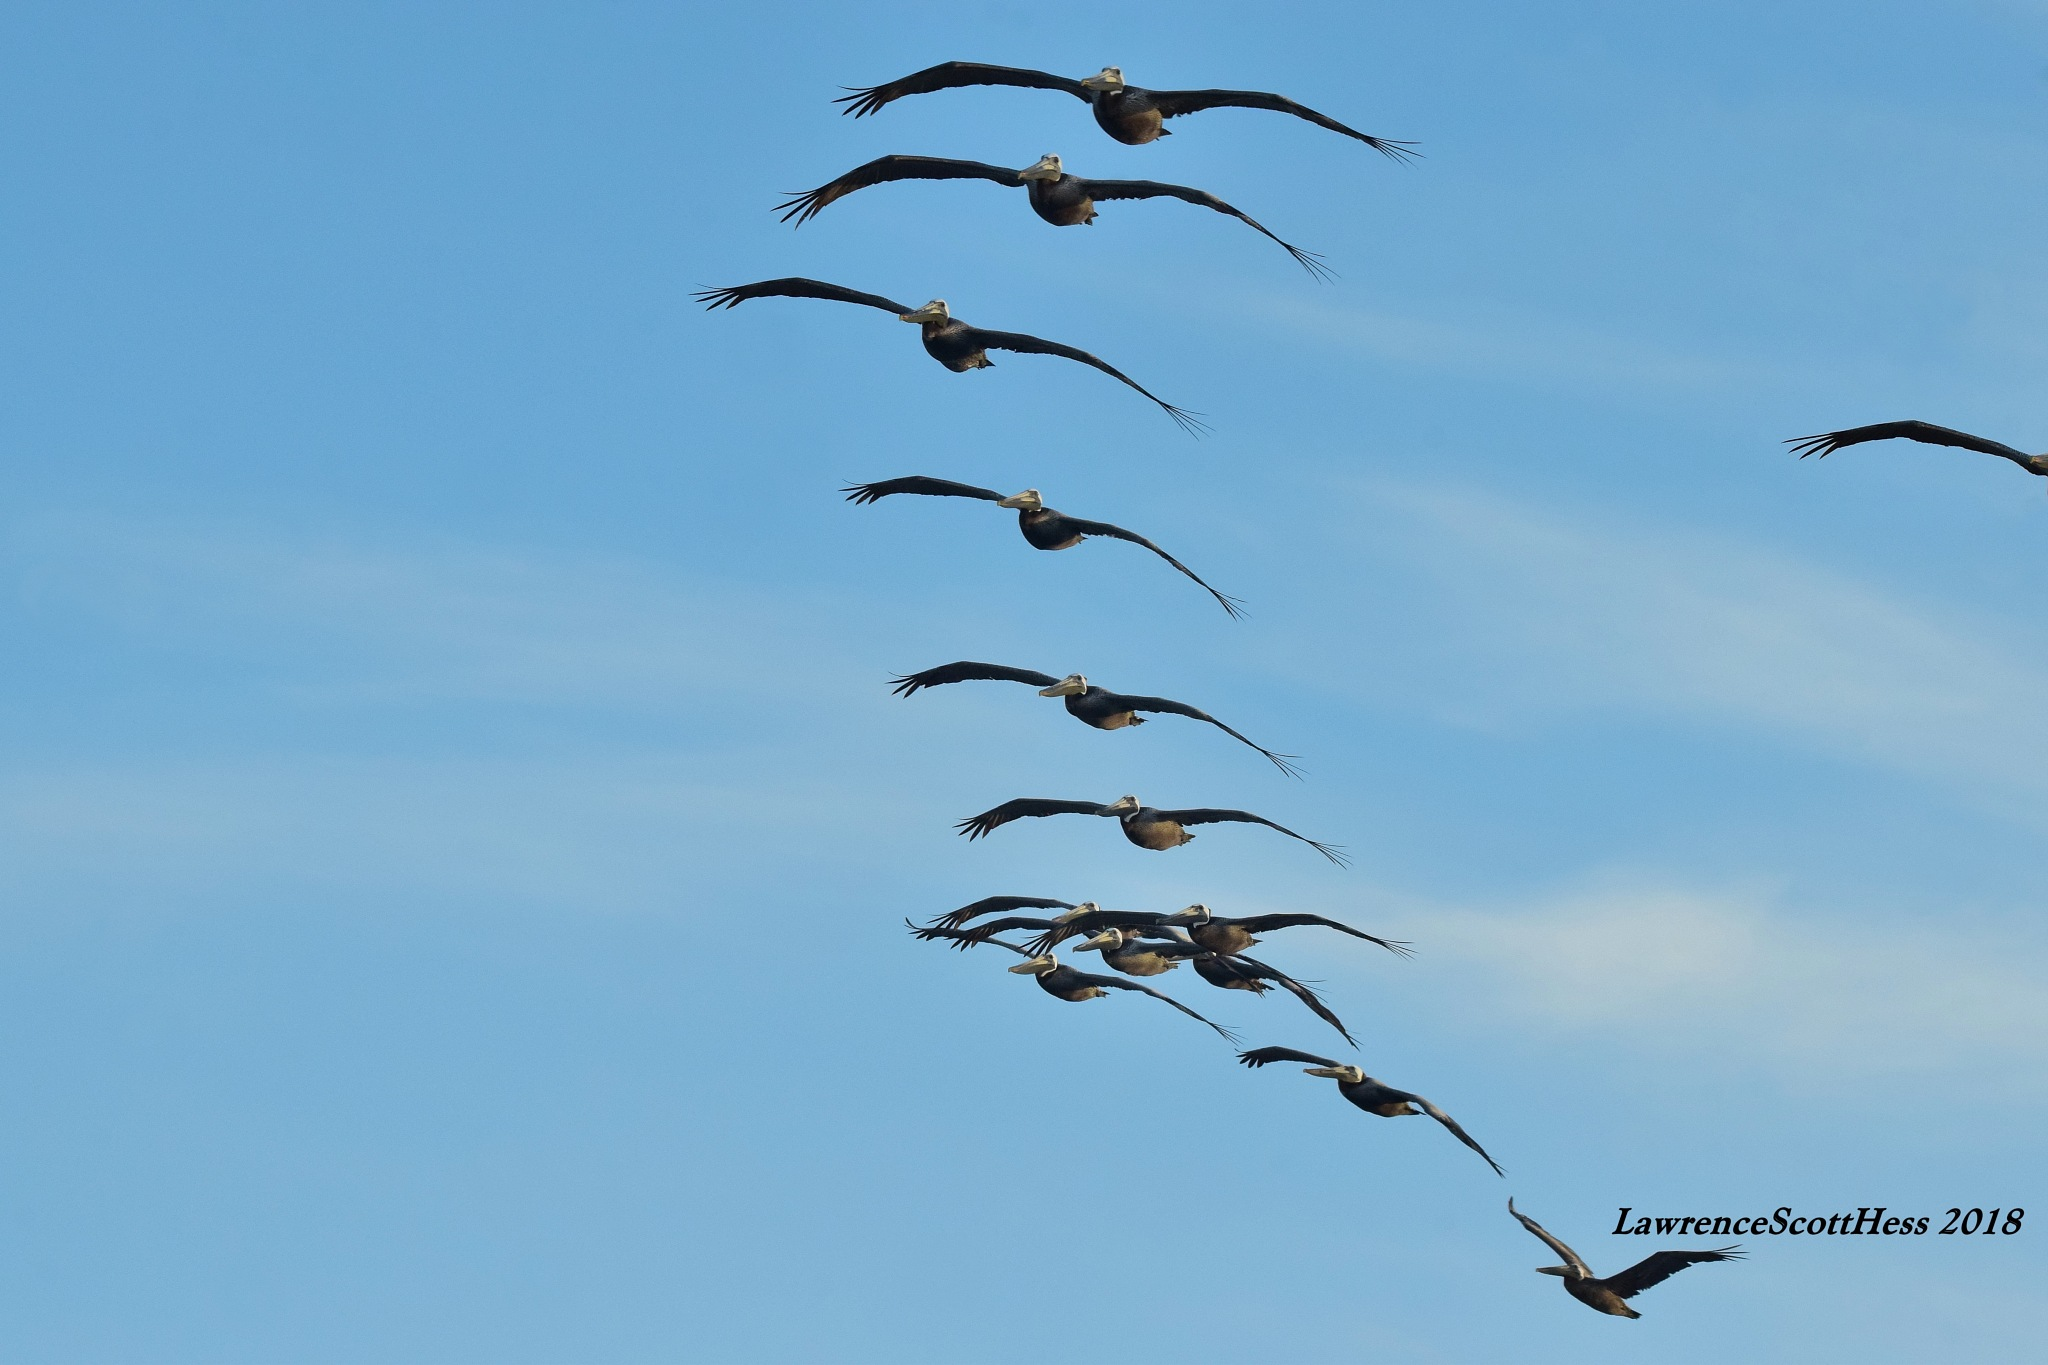 Galveston 340~Flying Pelicans by Lawrence Scott Hess